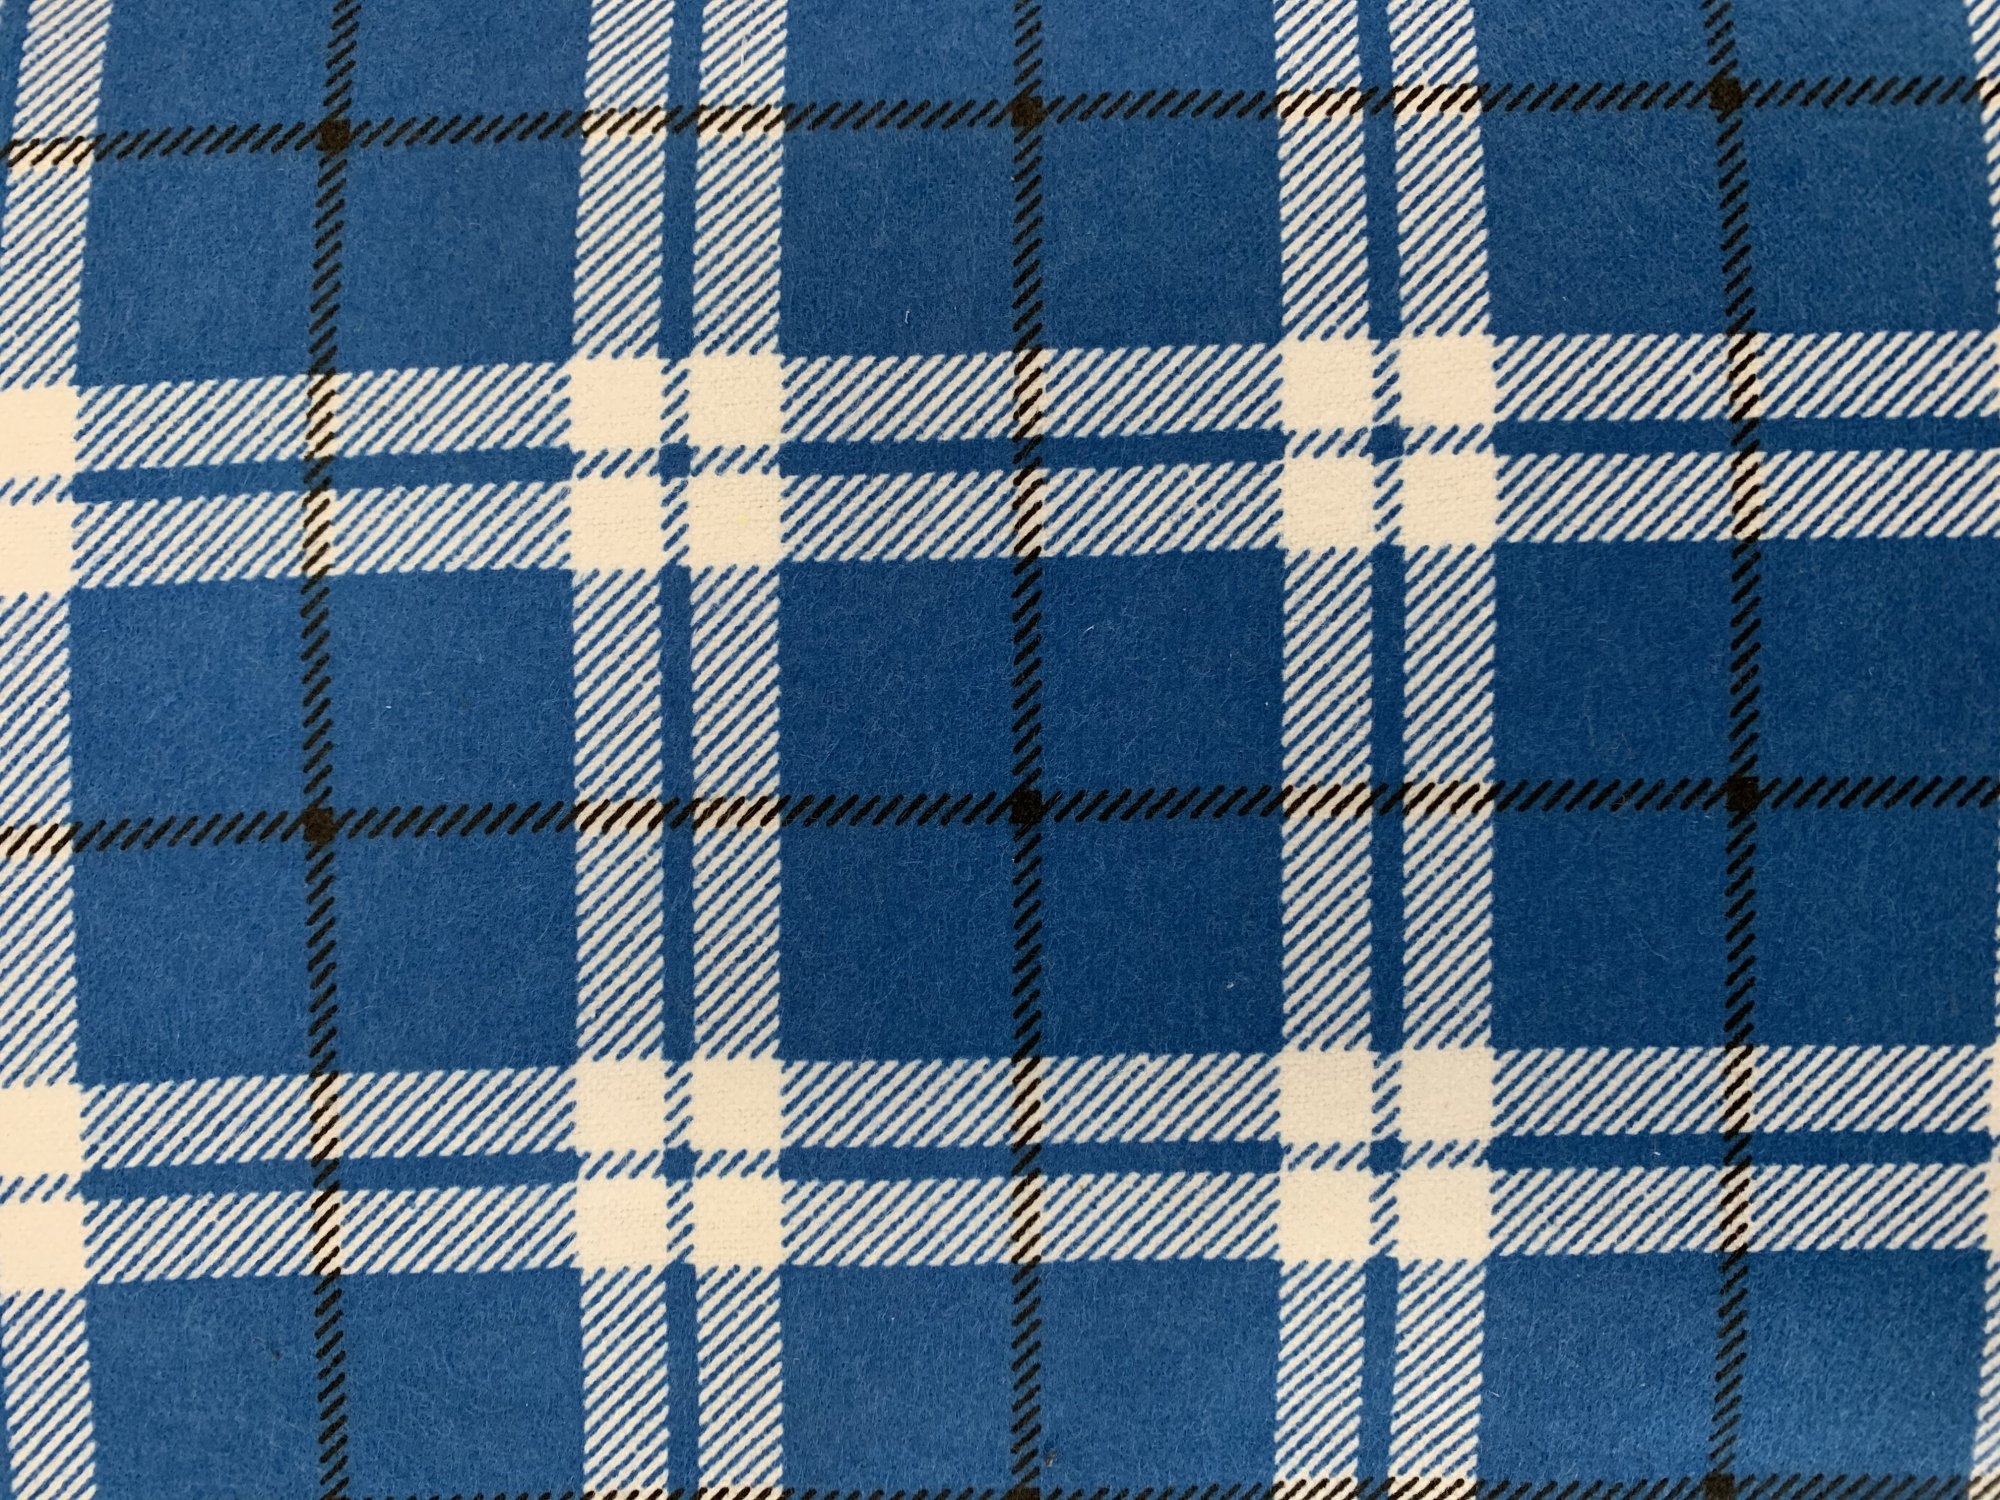 Blue/White Tartan Flannelette by Siltex